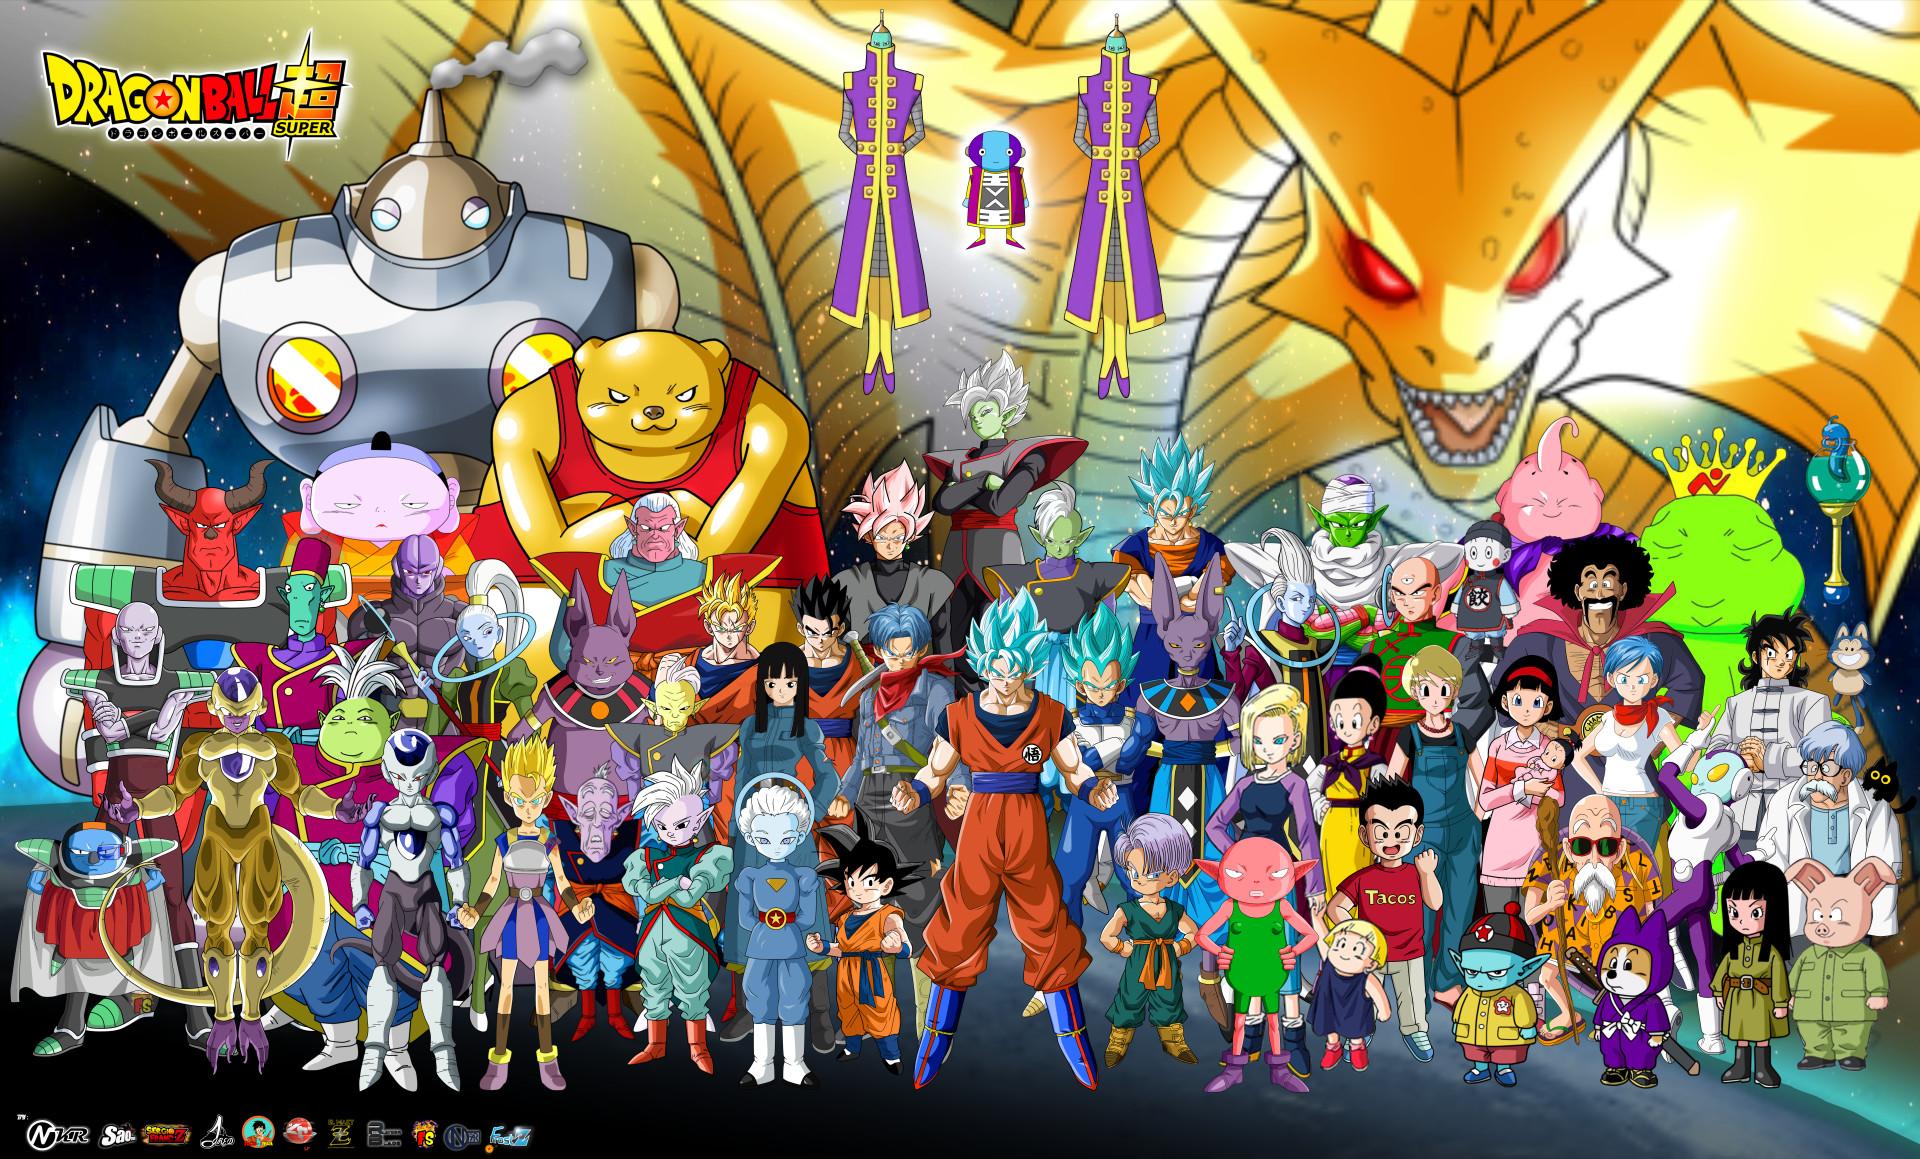 Goku Wallpaper Hd Dragon Ball Super Wallpapers 57 Pictures